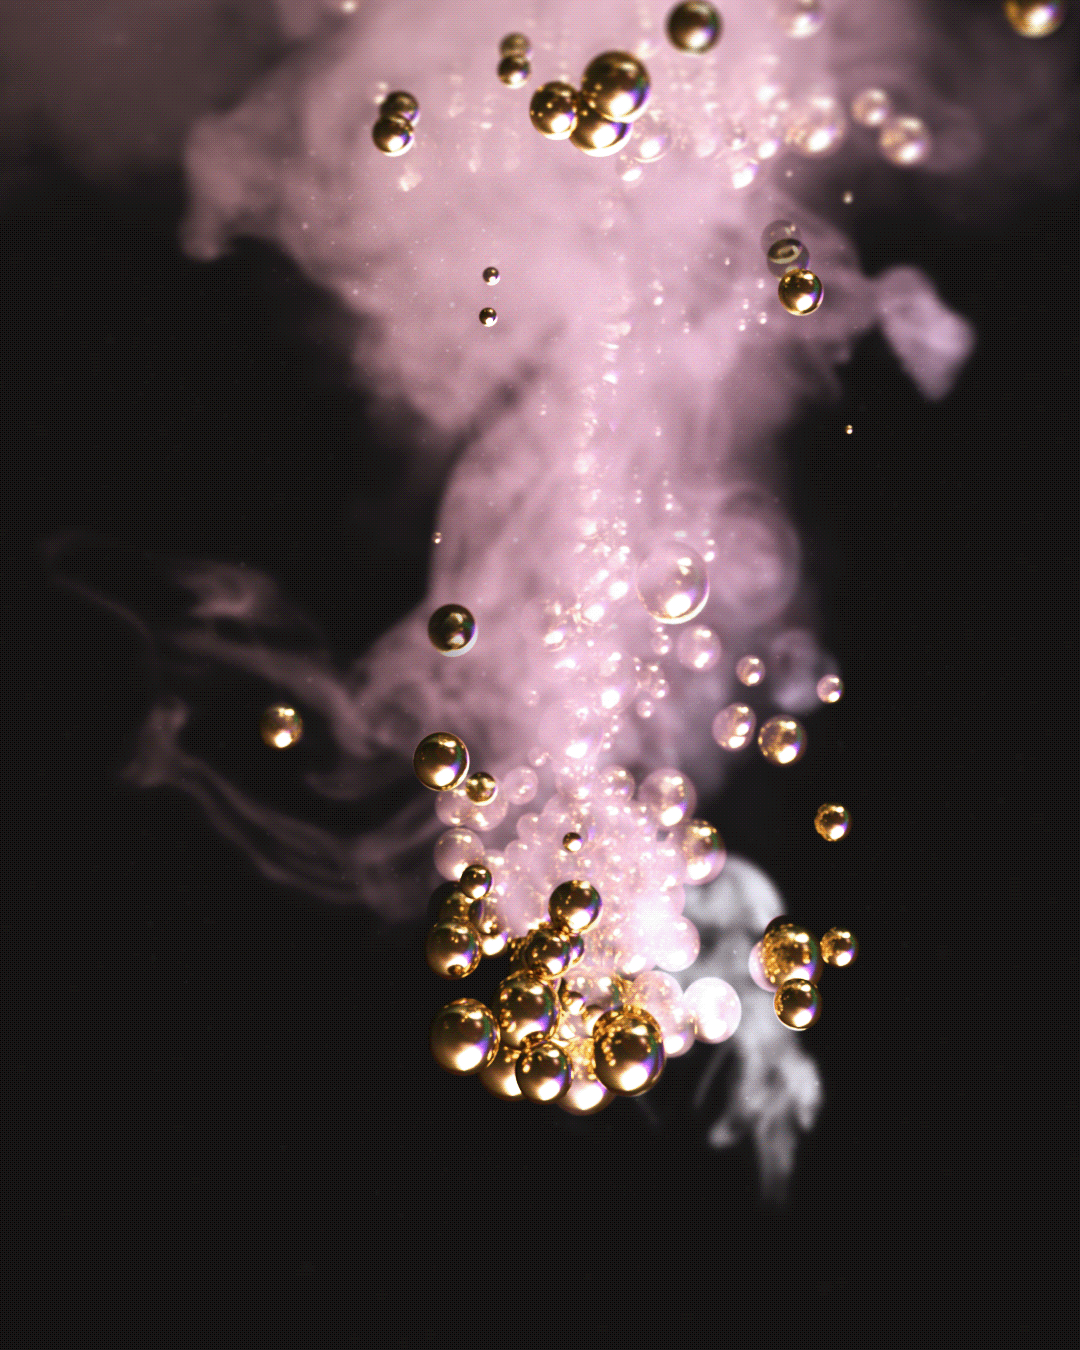 3D 3d art 3d render abstract dark Digital Art  fog Moody Render smoke